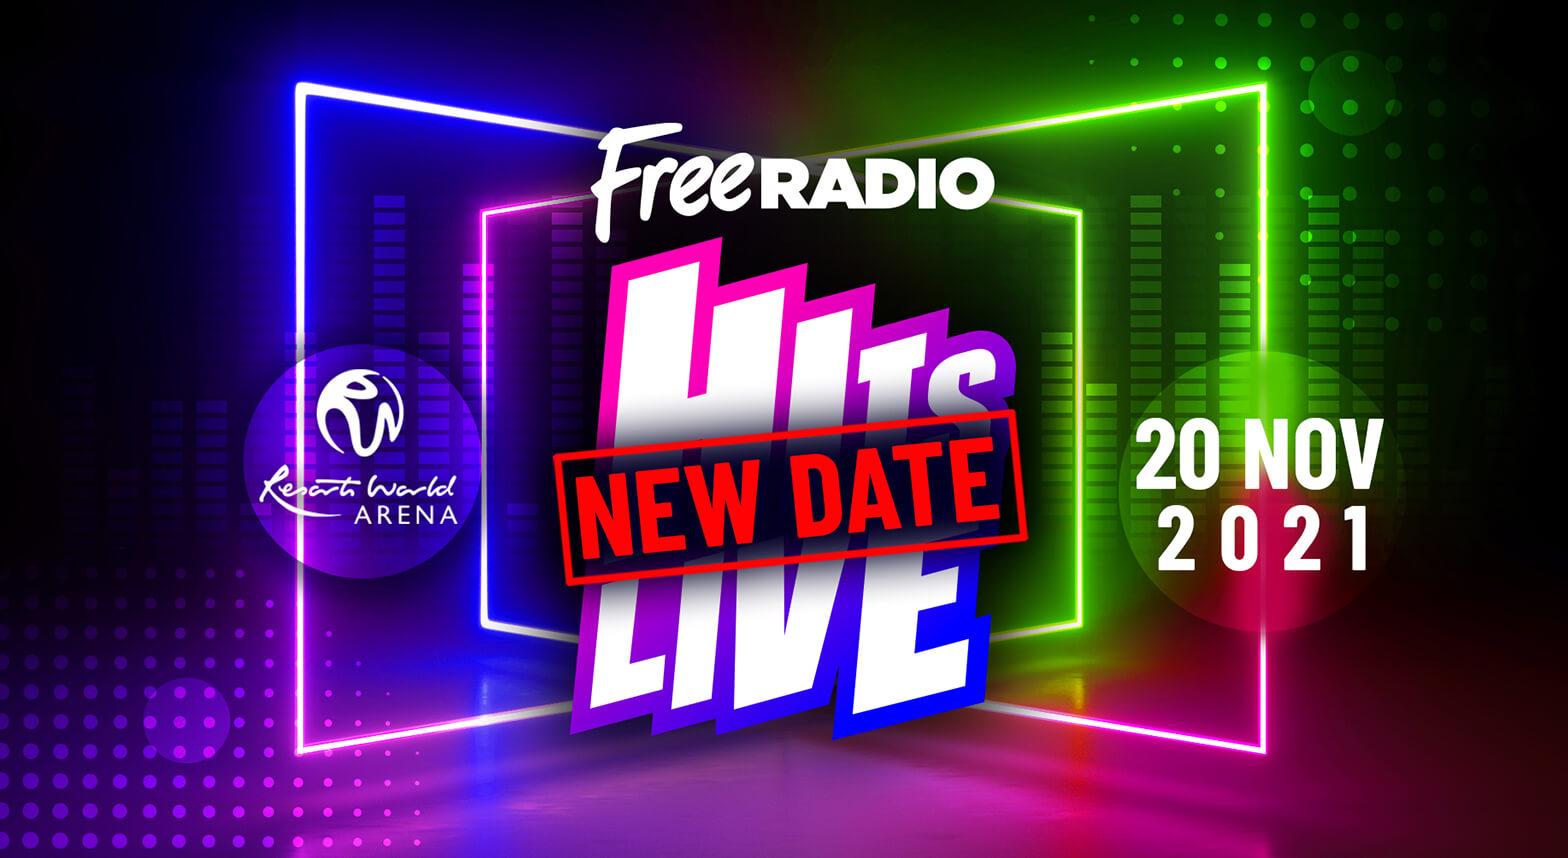 arenas-free-radio-update.jpg